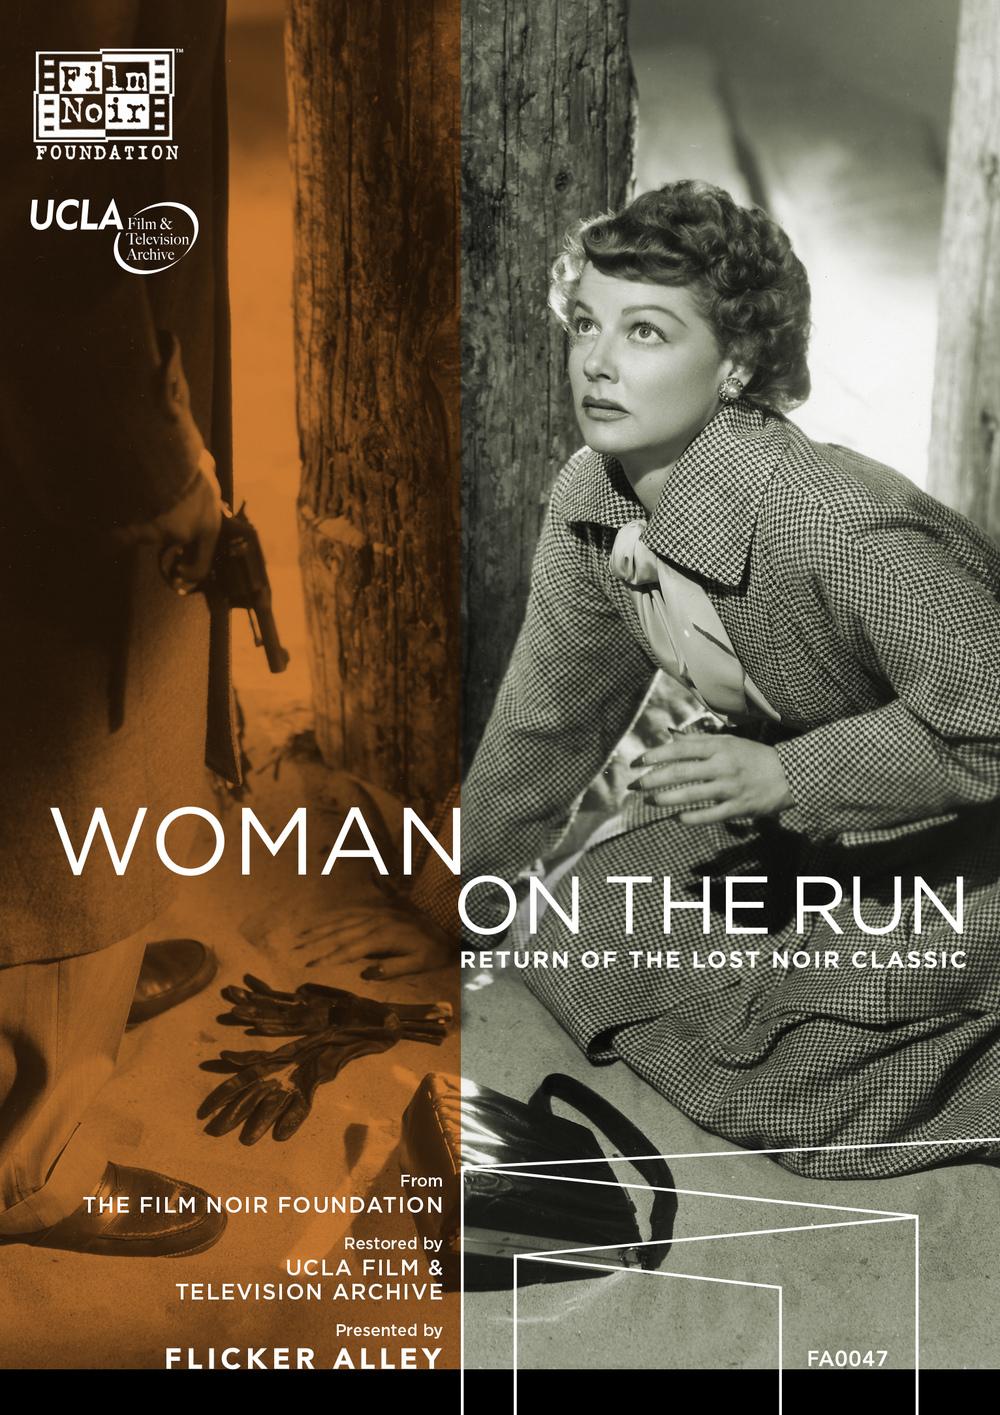 Woman+on+the+run-2.jpg